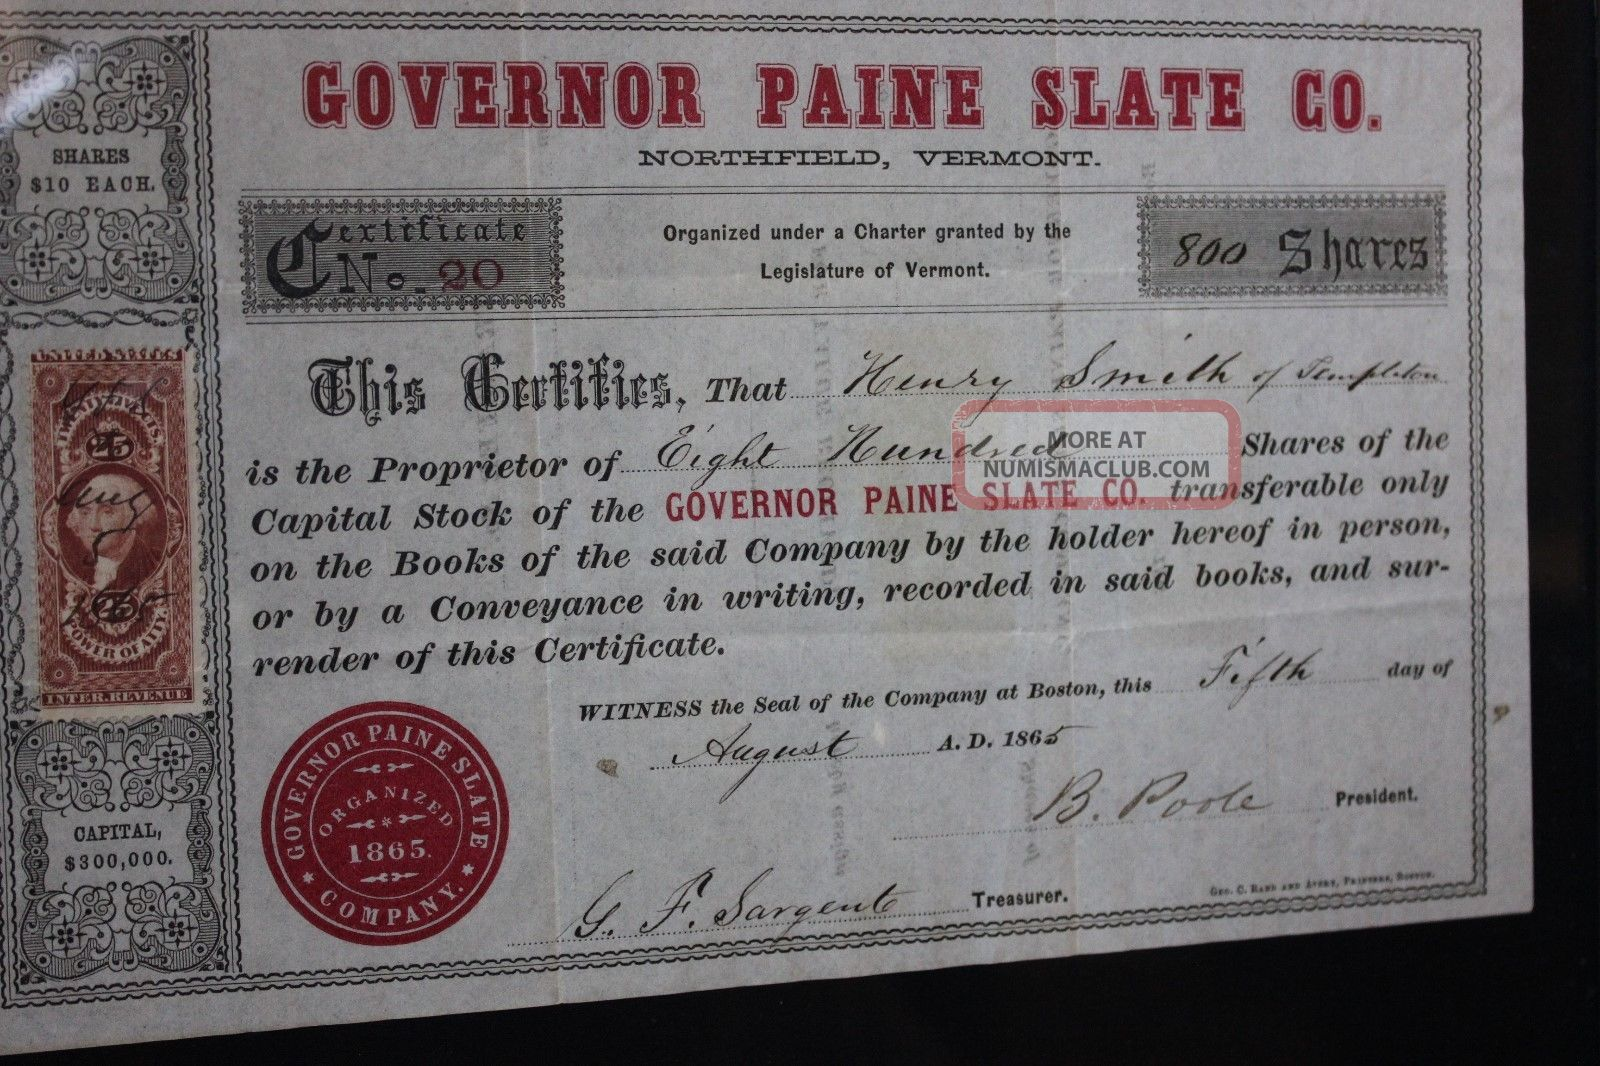 Antique Northfield Vermont Governor Paine Slate Company Stock Certificate 1865 Stocks & Bonds, Scripophily photo